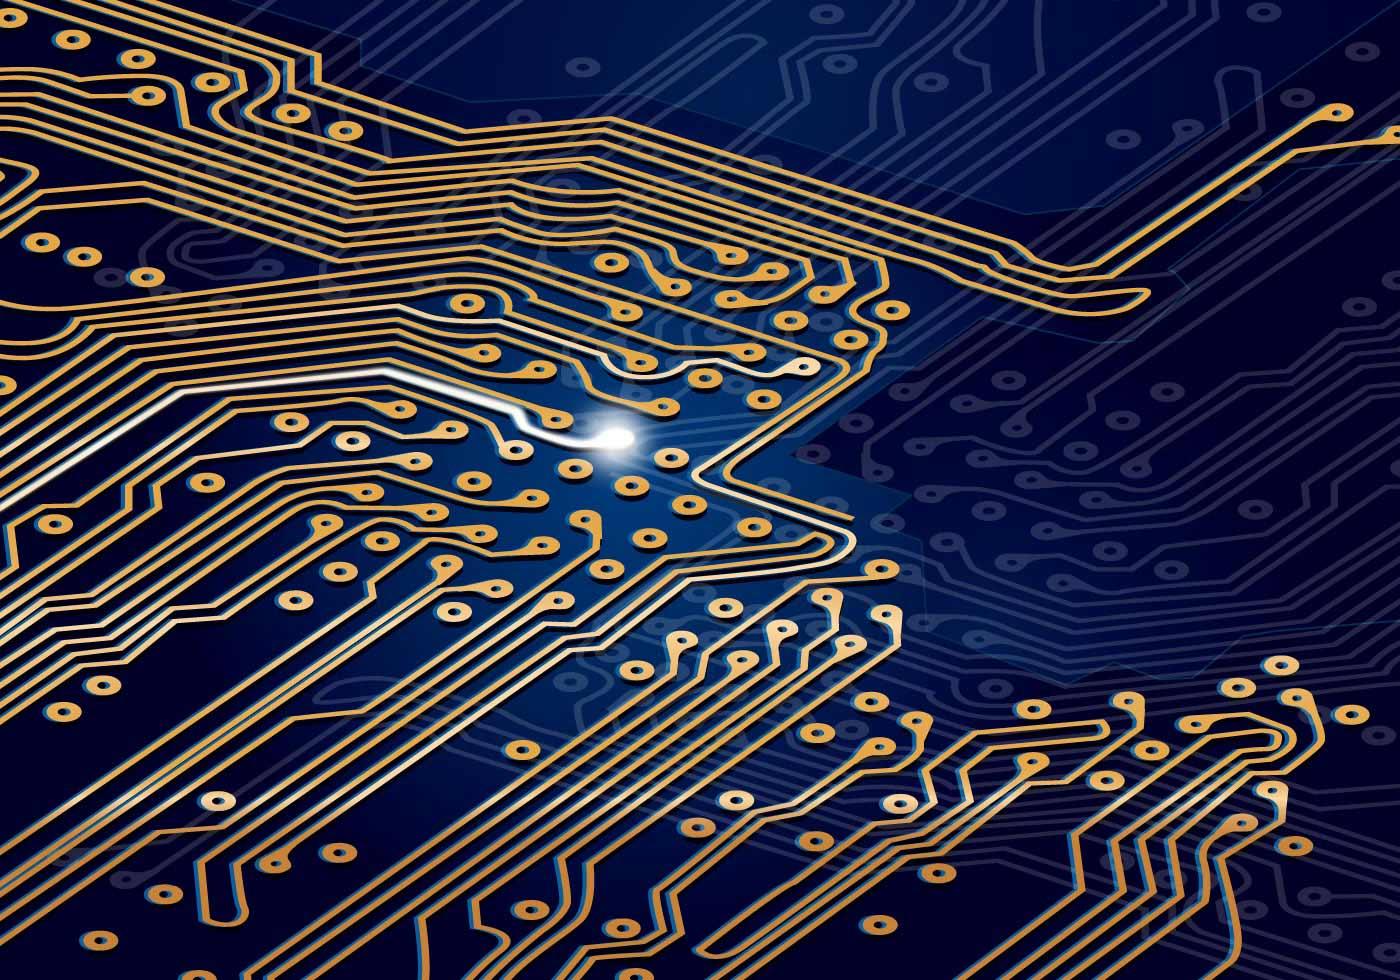 Motherboard Circuit Illustration: Download Free Vector Art, Stock